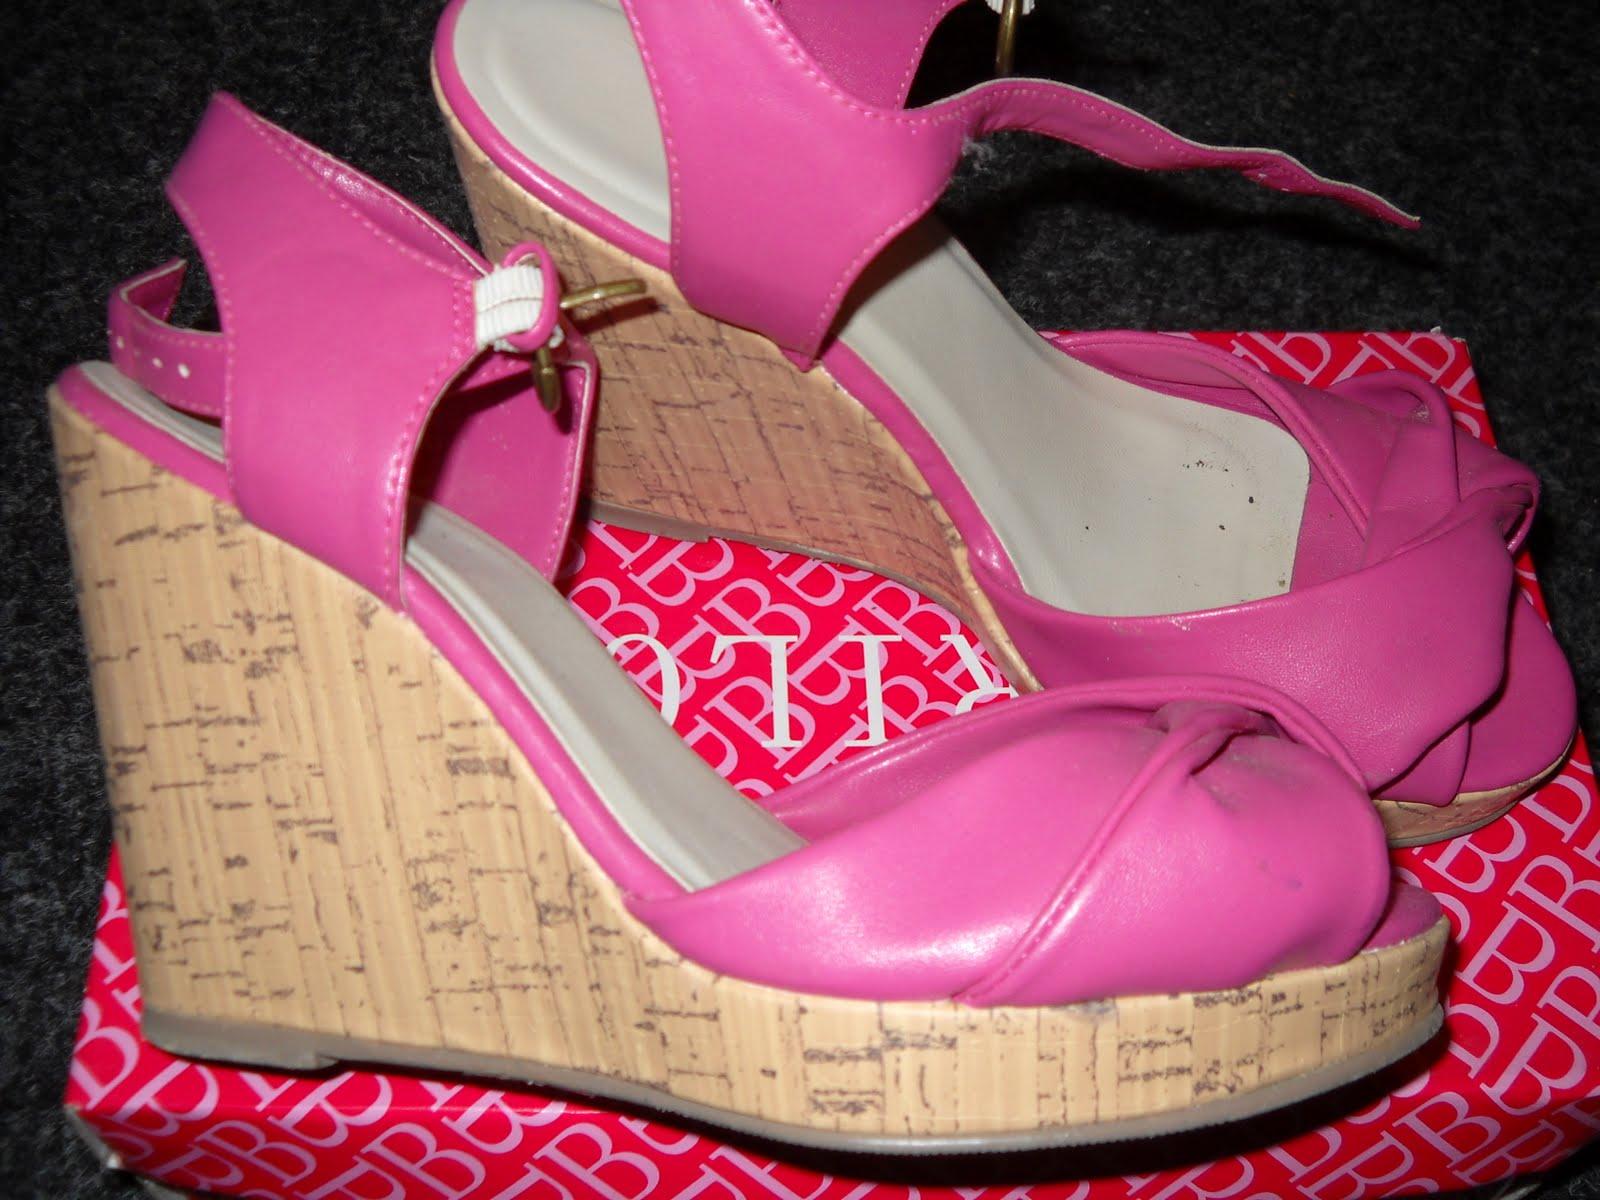 haine la moda si ieftine sandale qelle purtati o singura data nr 37. Black Bedroom Furniture Sets. Home Design Ideas